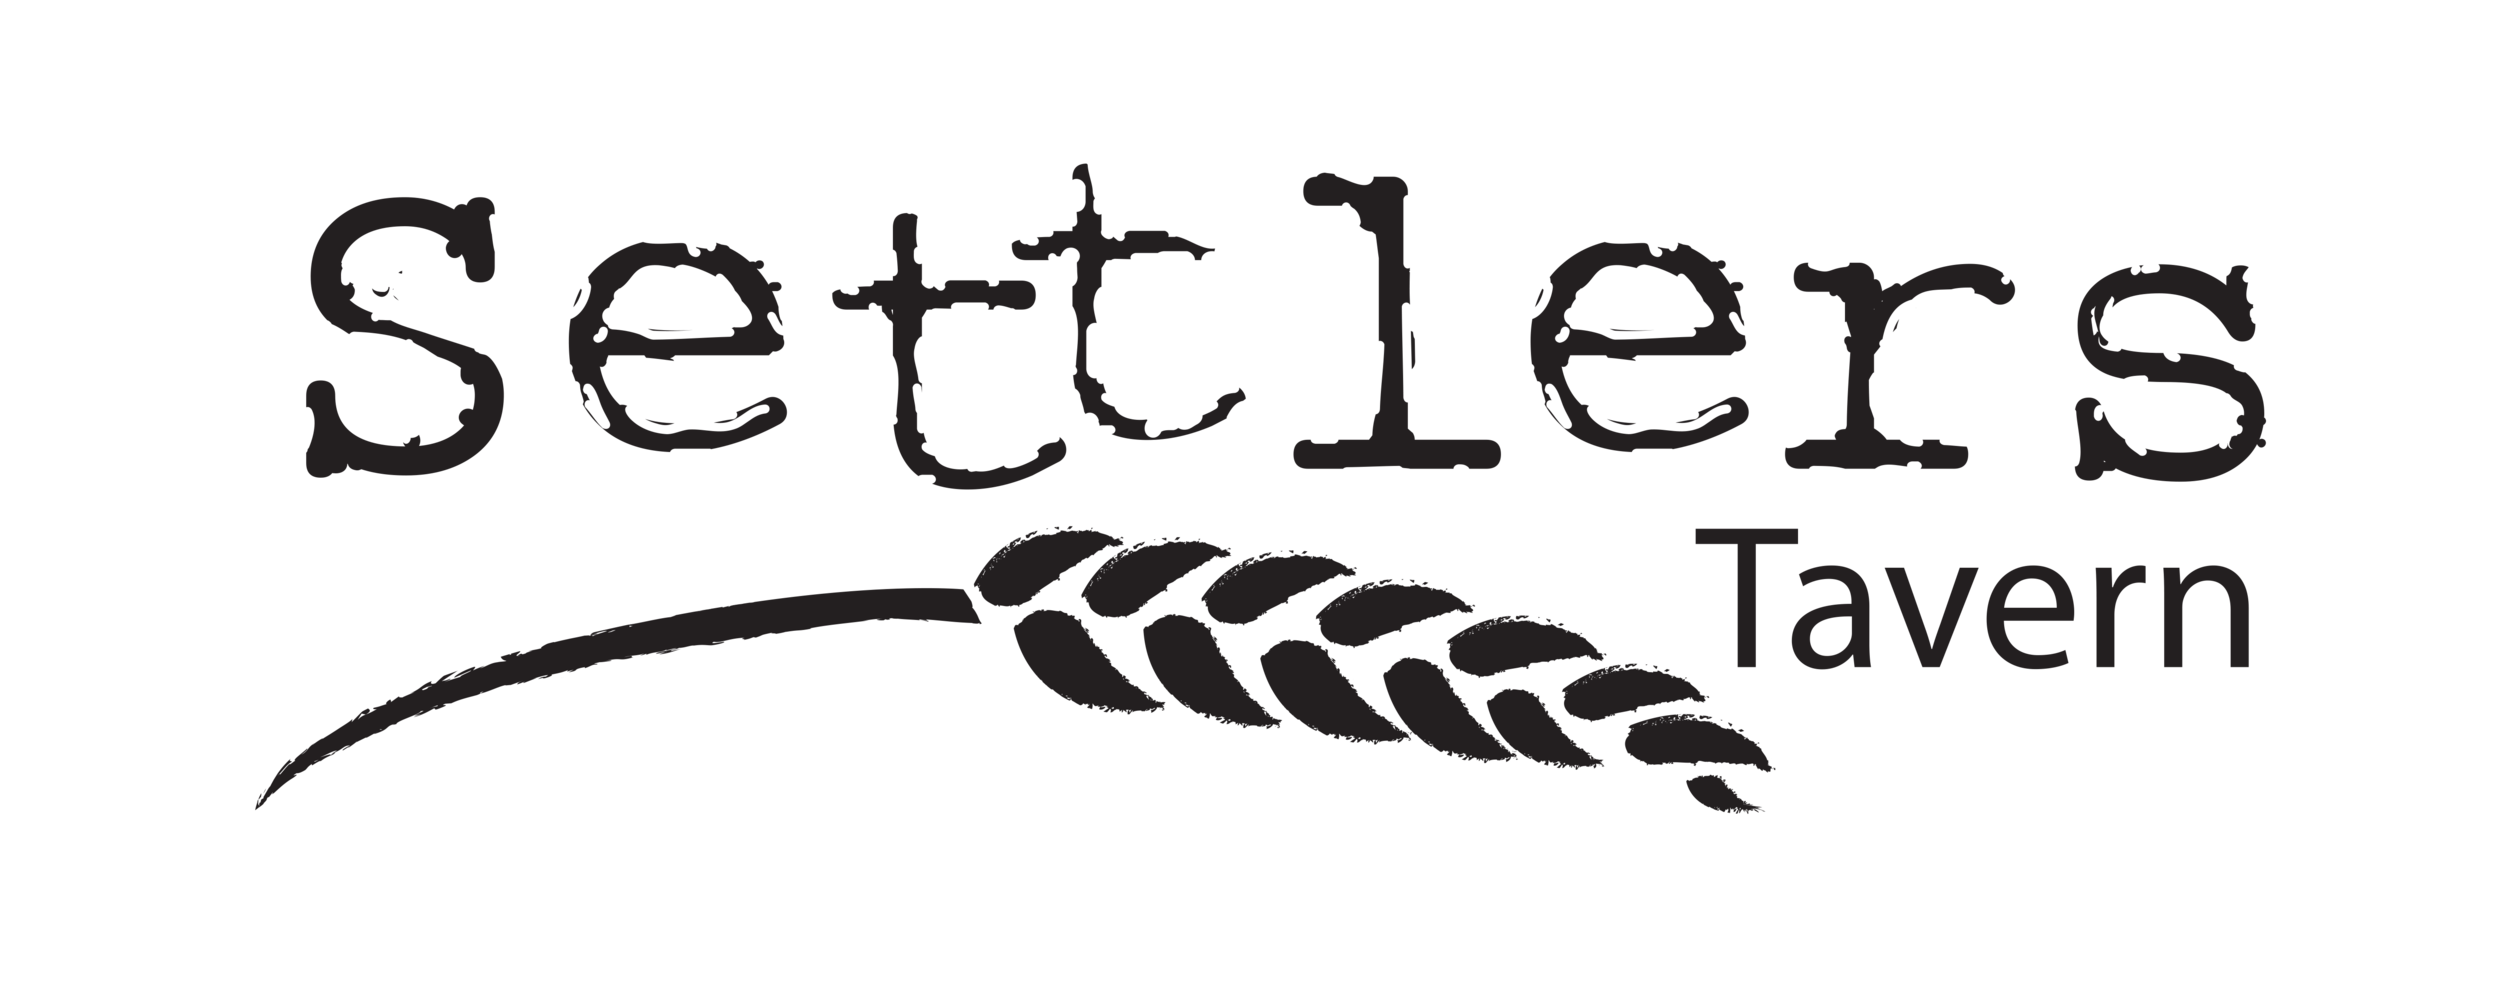 Settlers_Tavern Logo.png